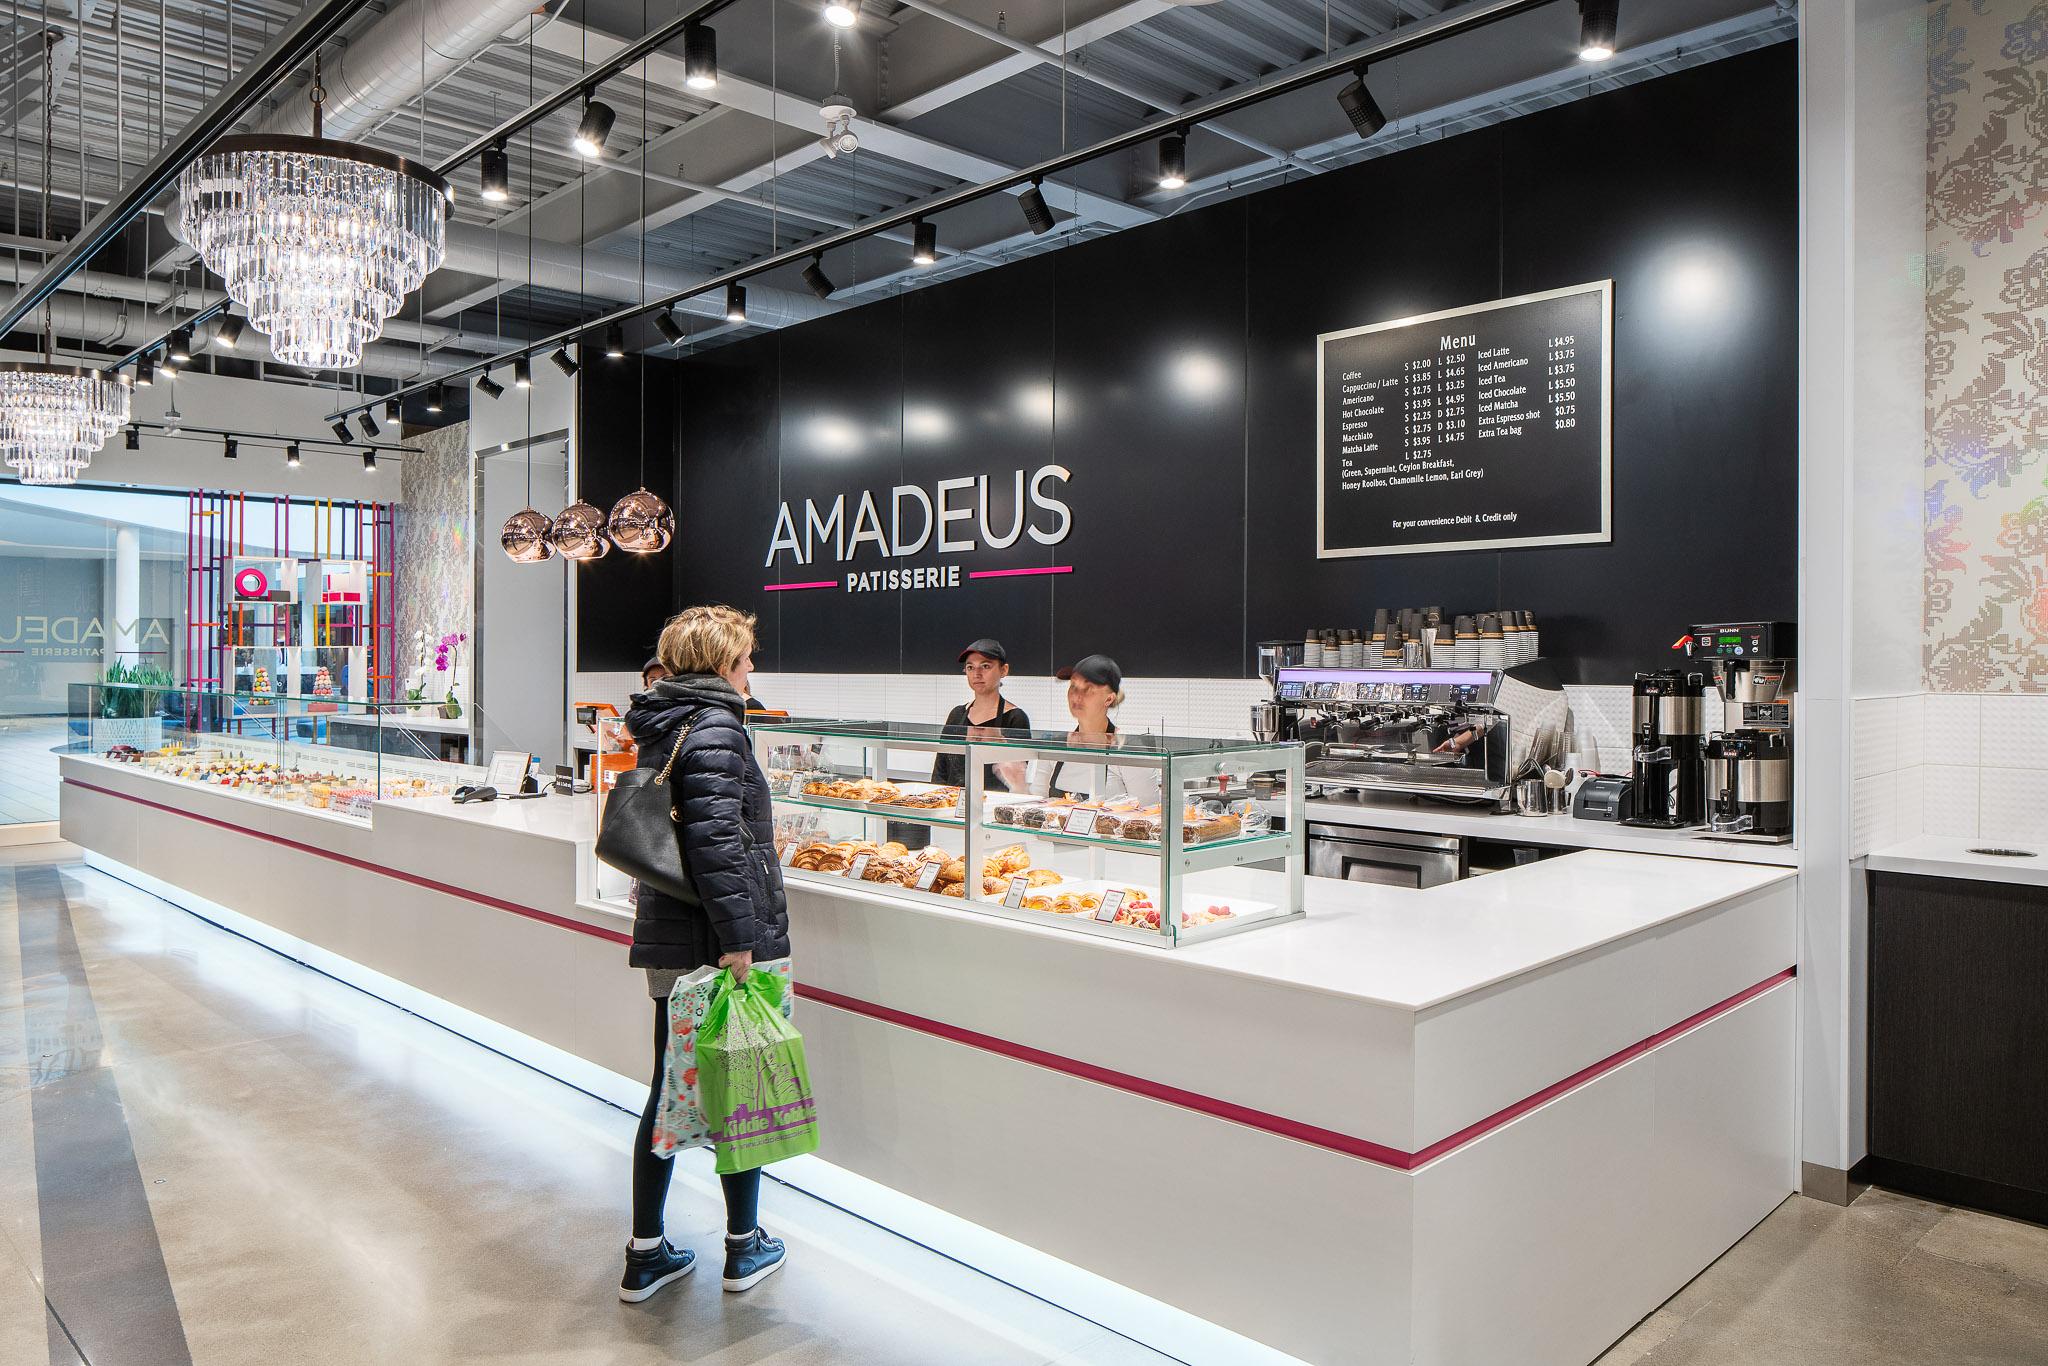 Amadeus 01 2048.jpg